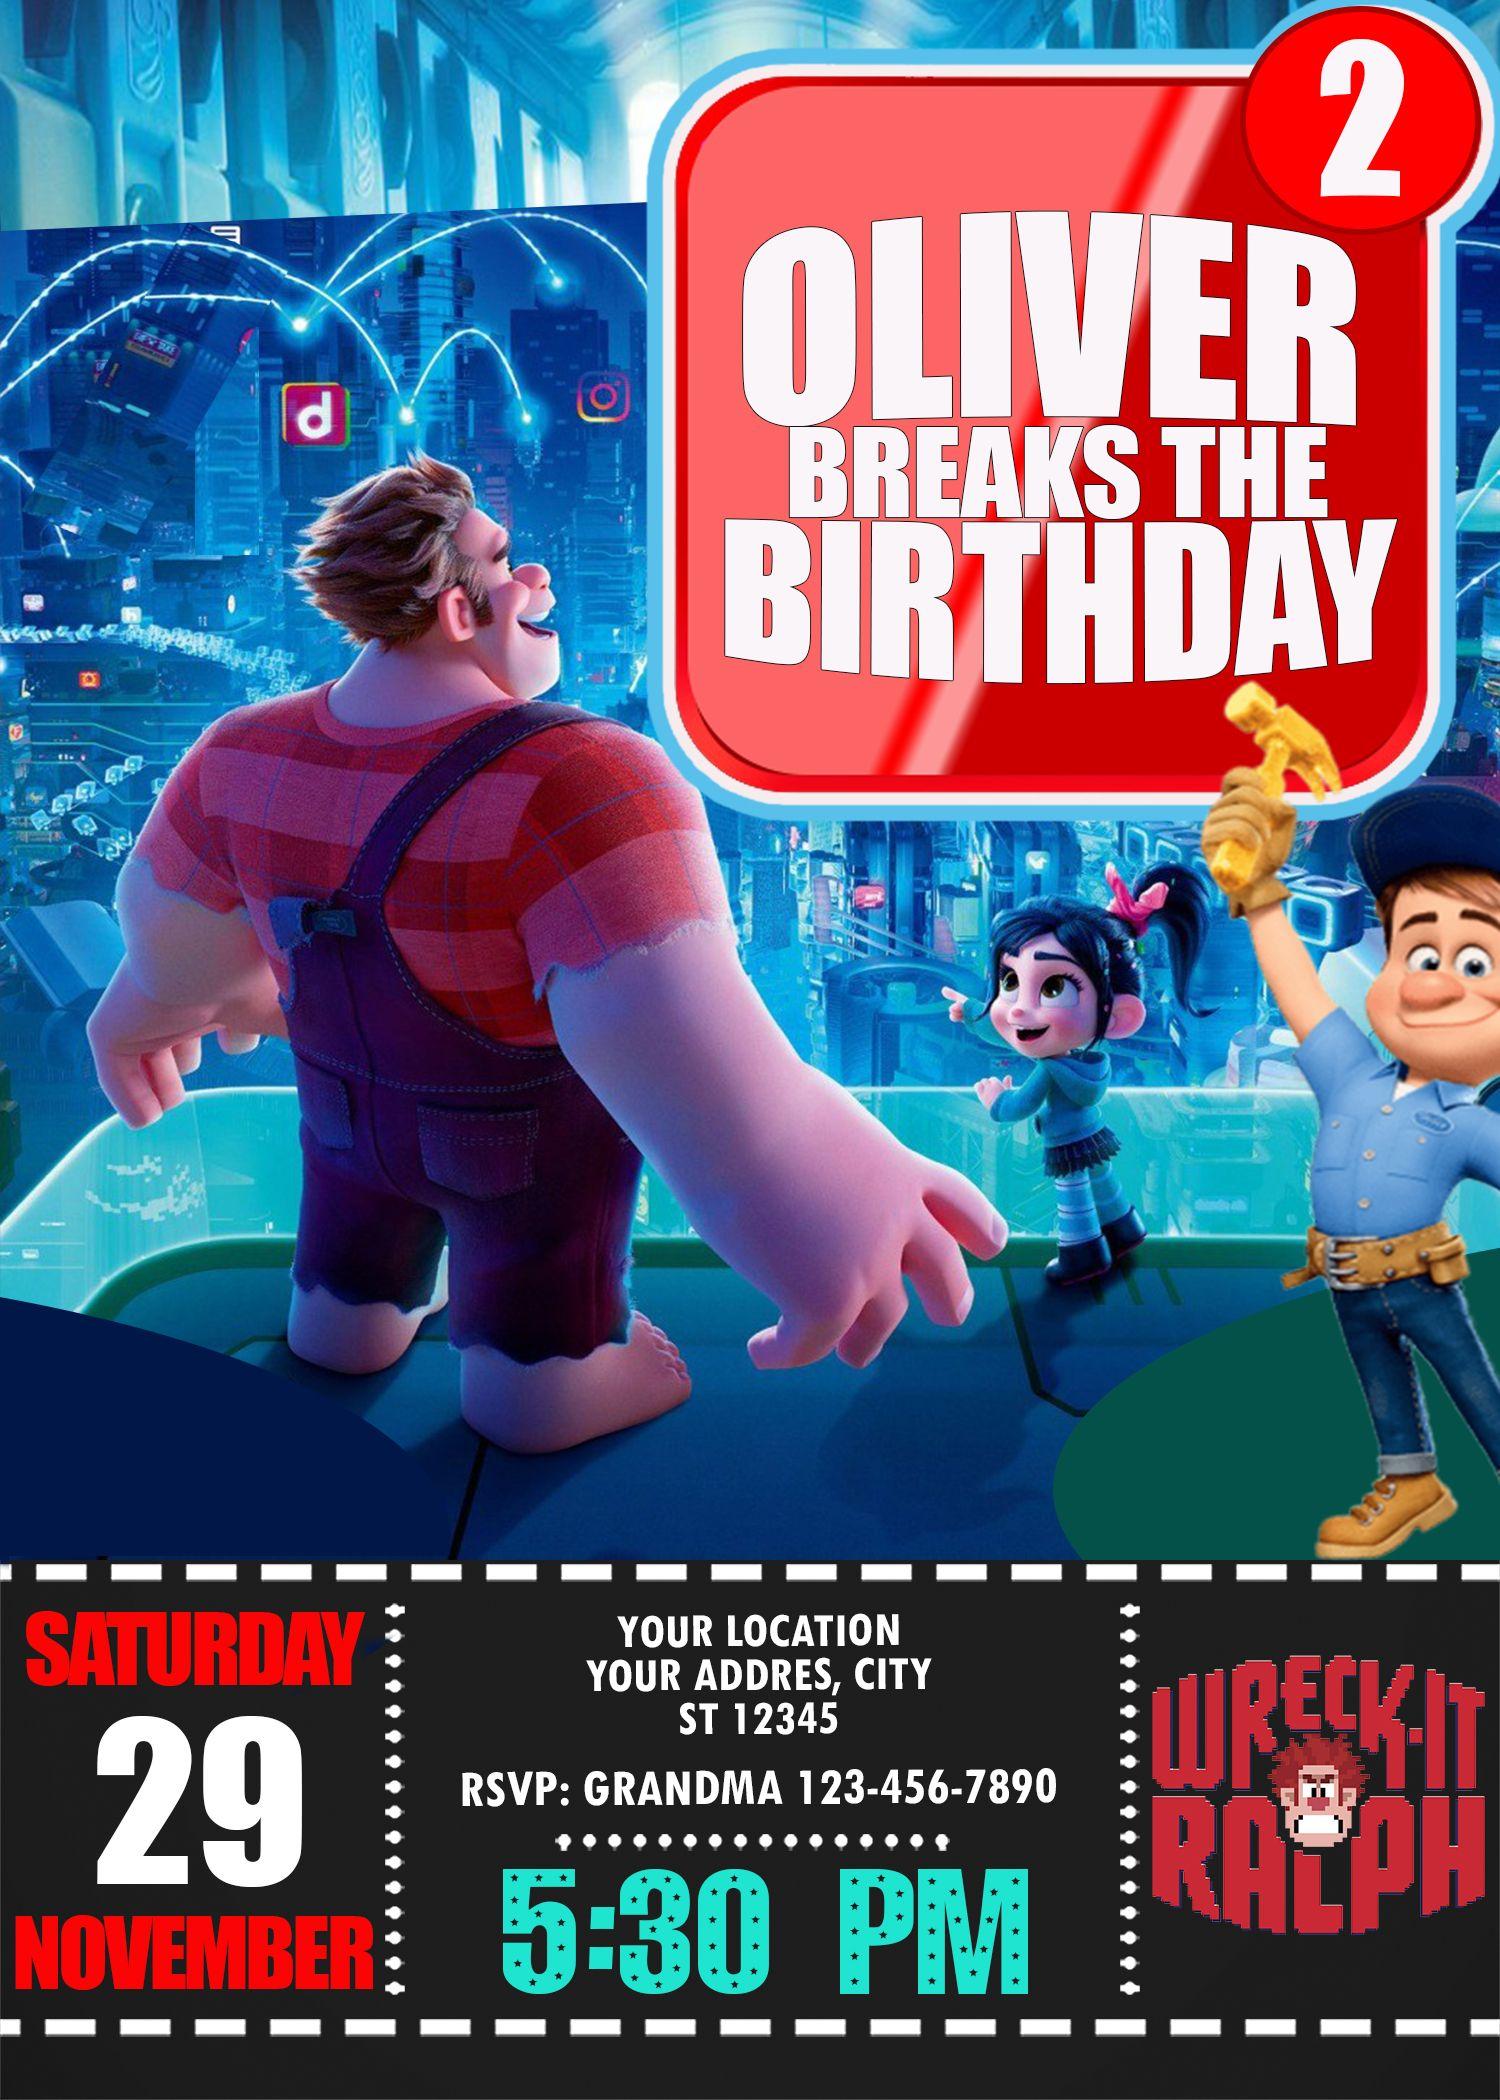 Ralph Breaks The Internet Birthday Party Invitation Birthday Party Invitations Birthday Party Invitations Printable Birthday Invitations